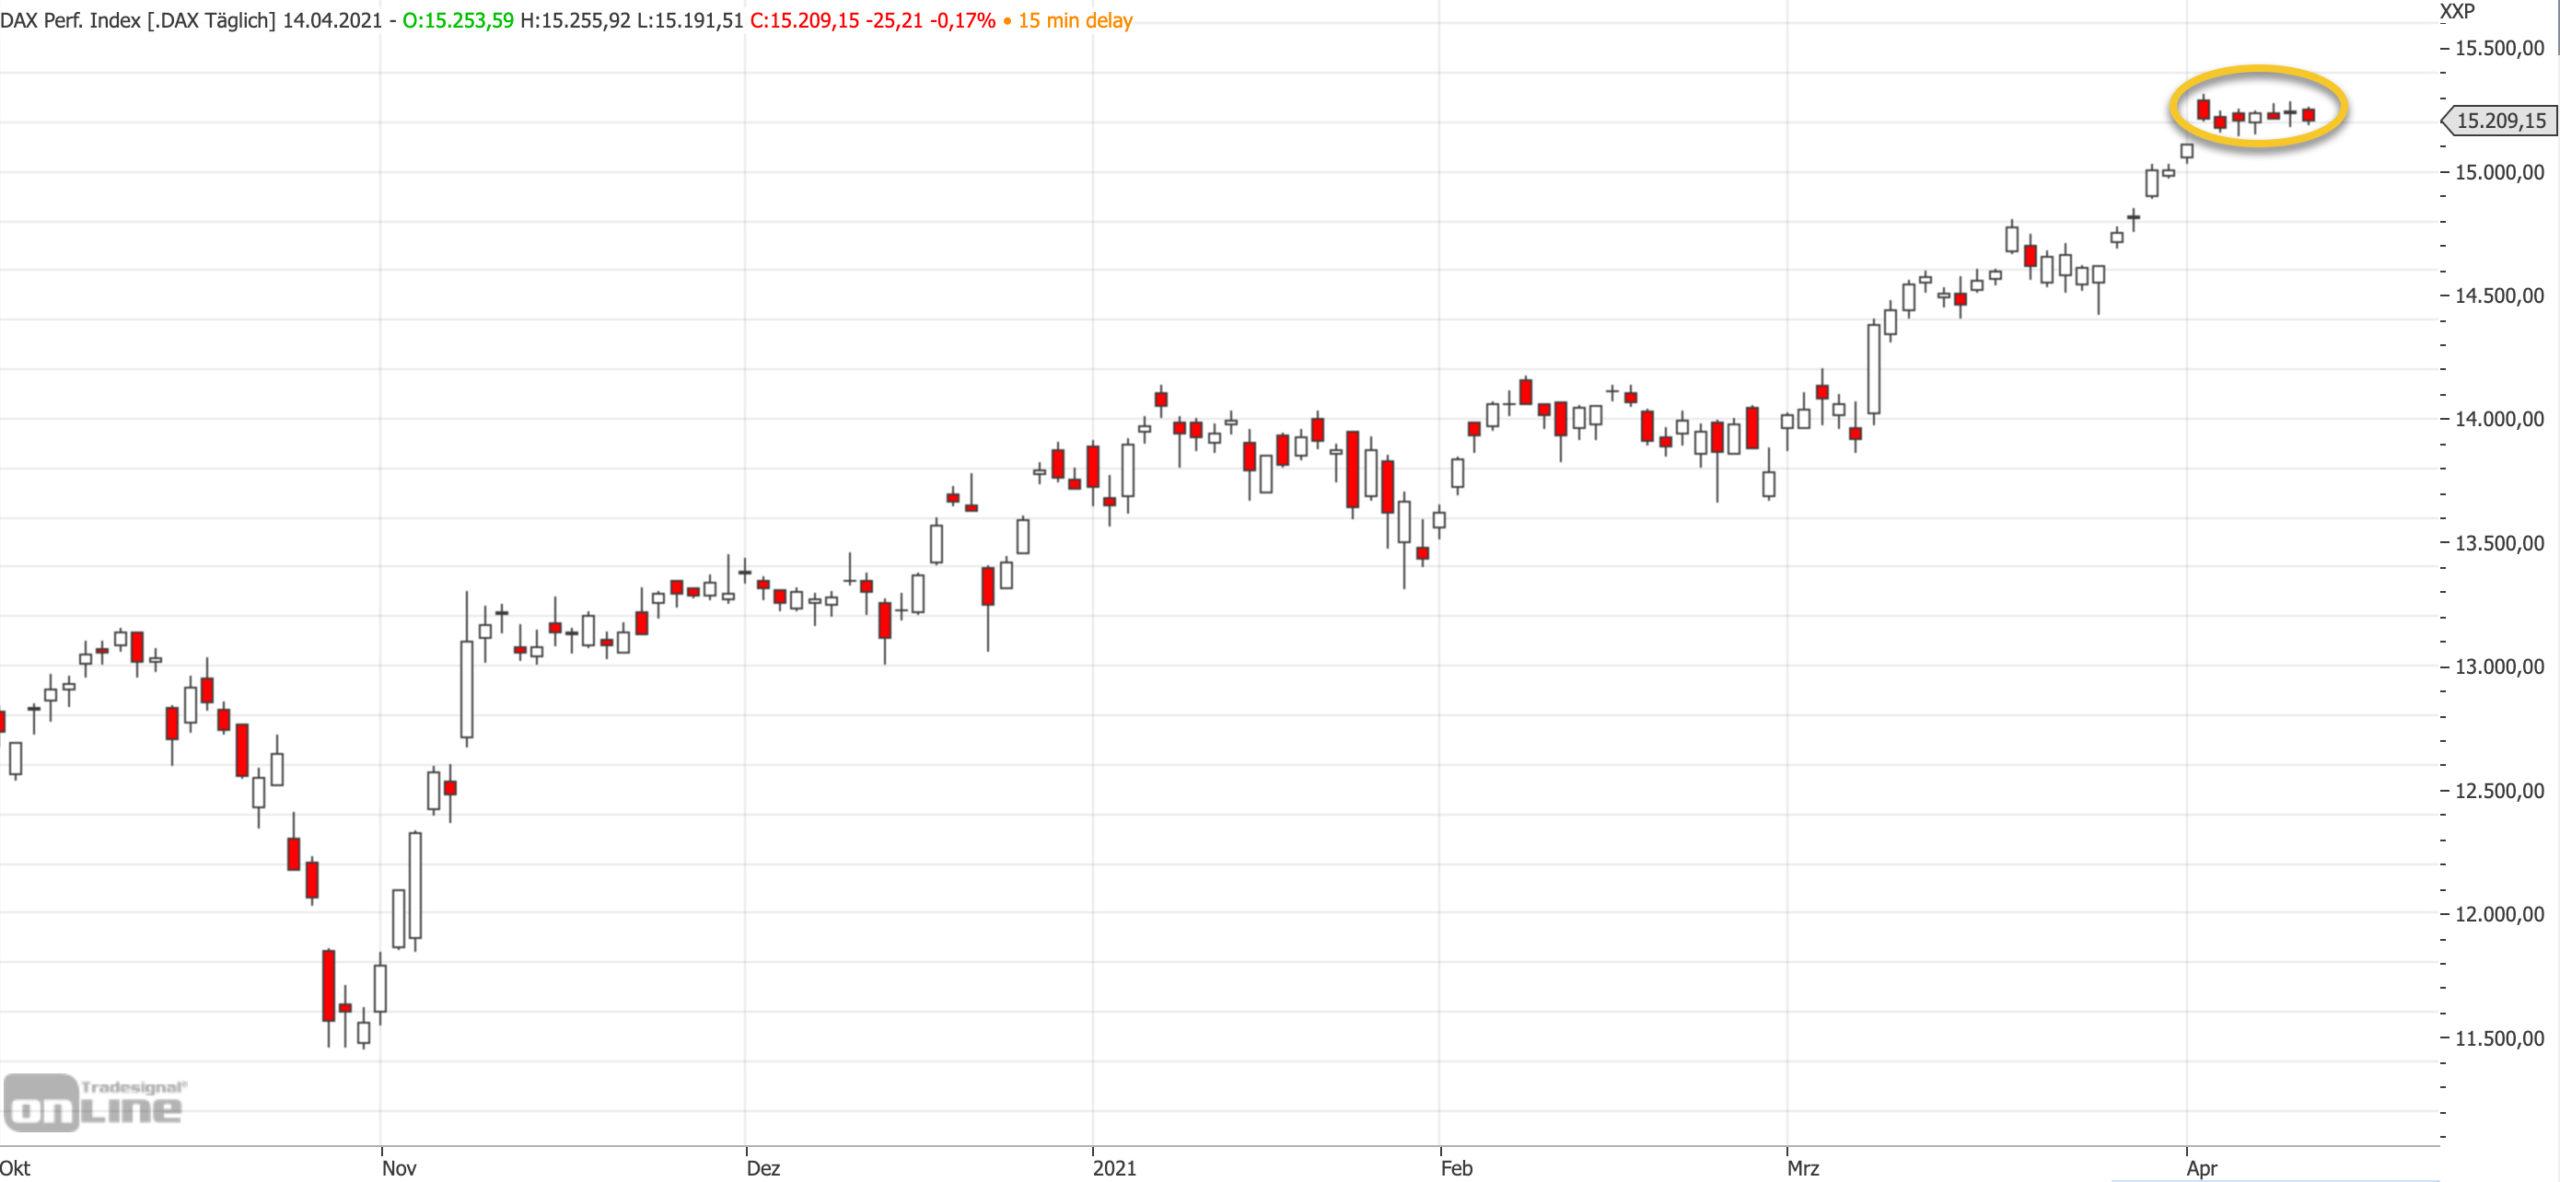 Mittelfristiger DAX-Chart am 14.04.2021